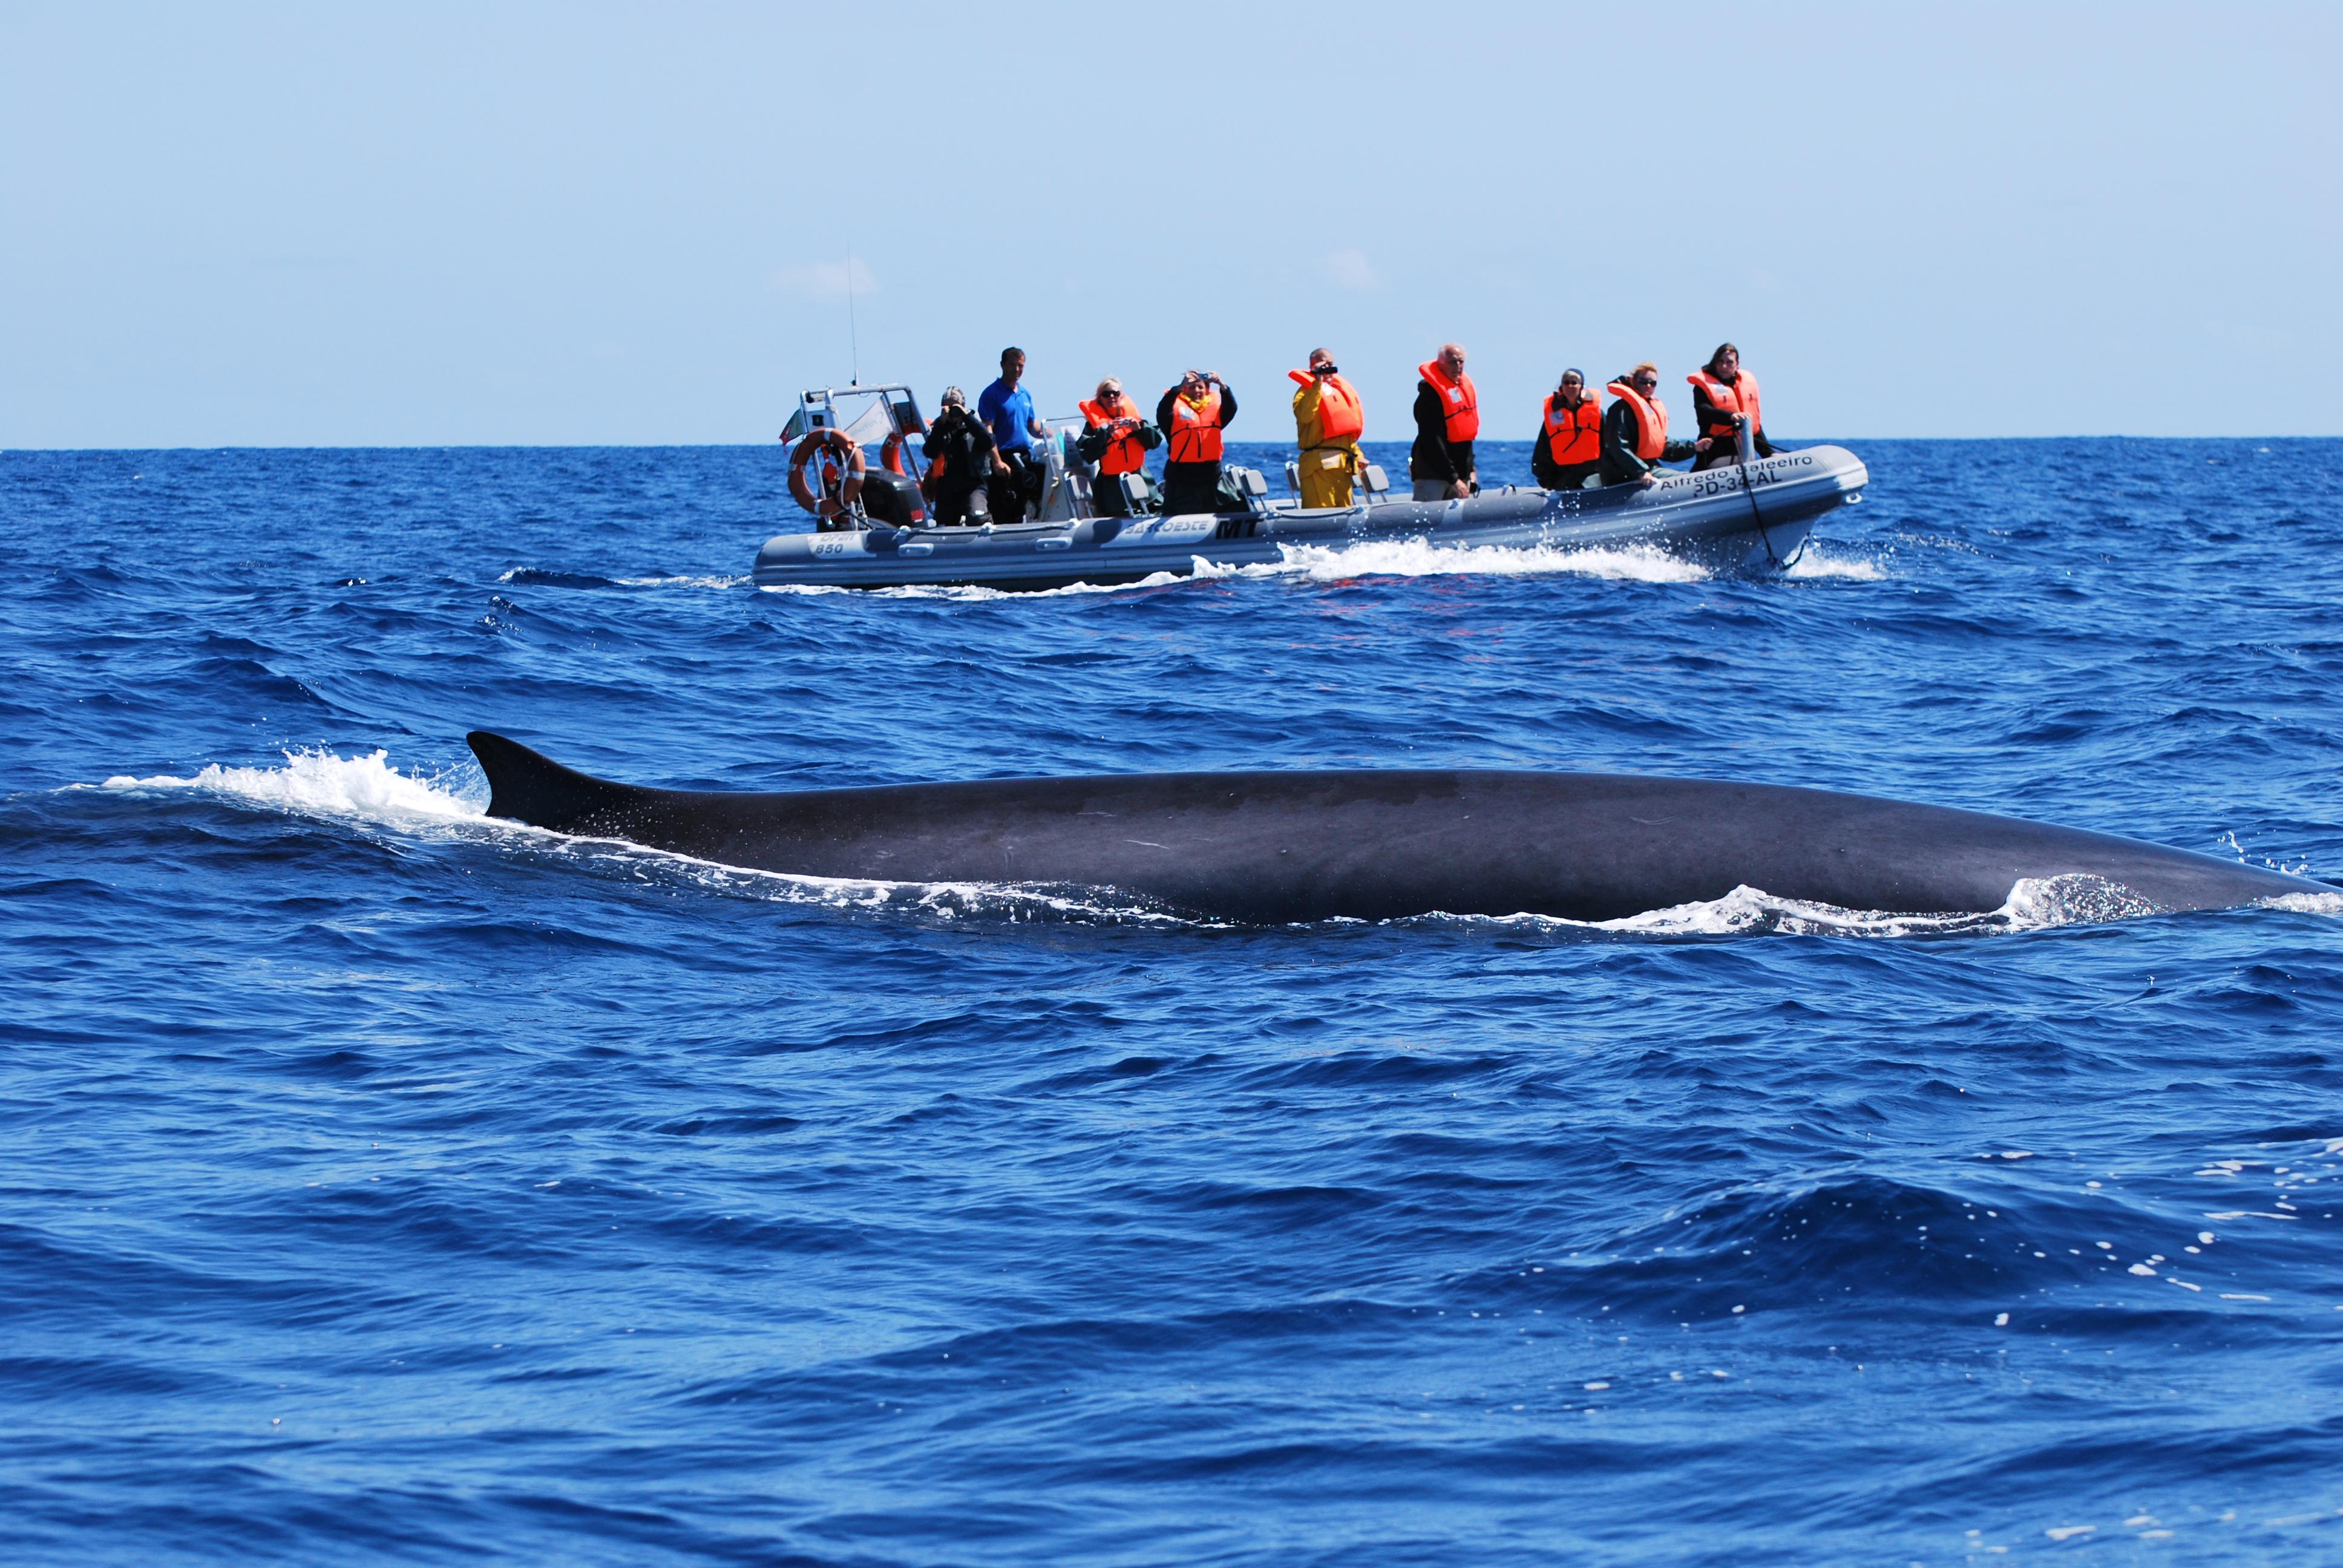 Azoren_whale watching 3_Sao Miguel